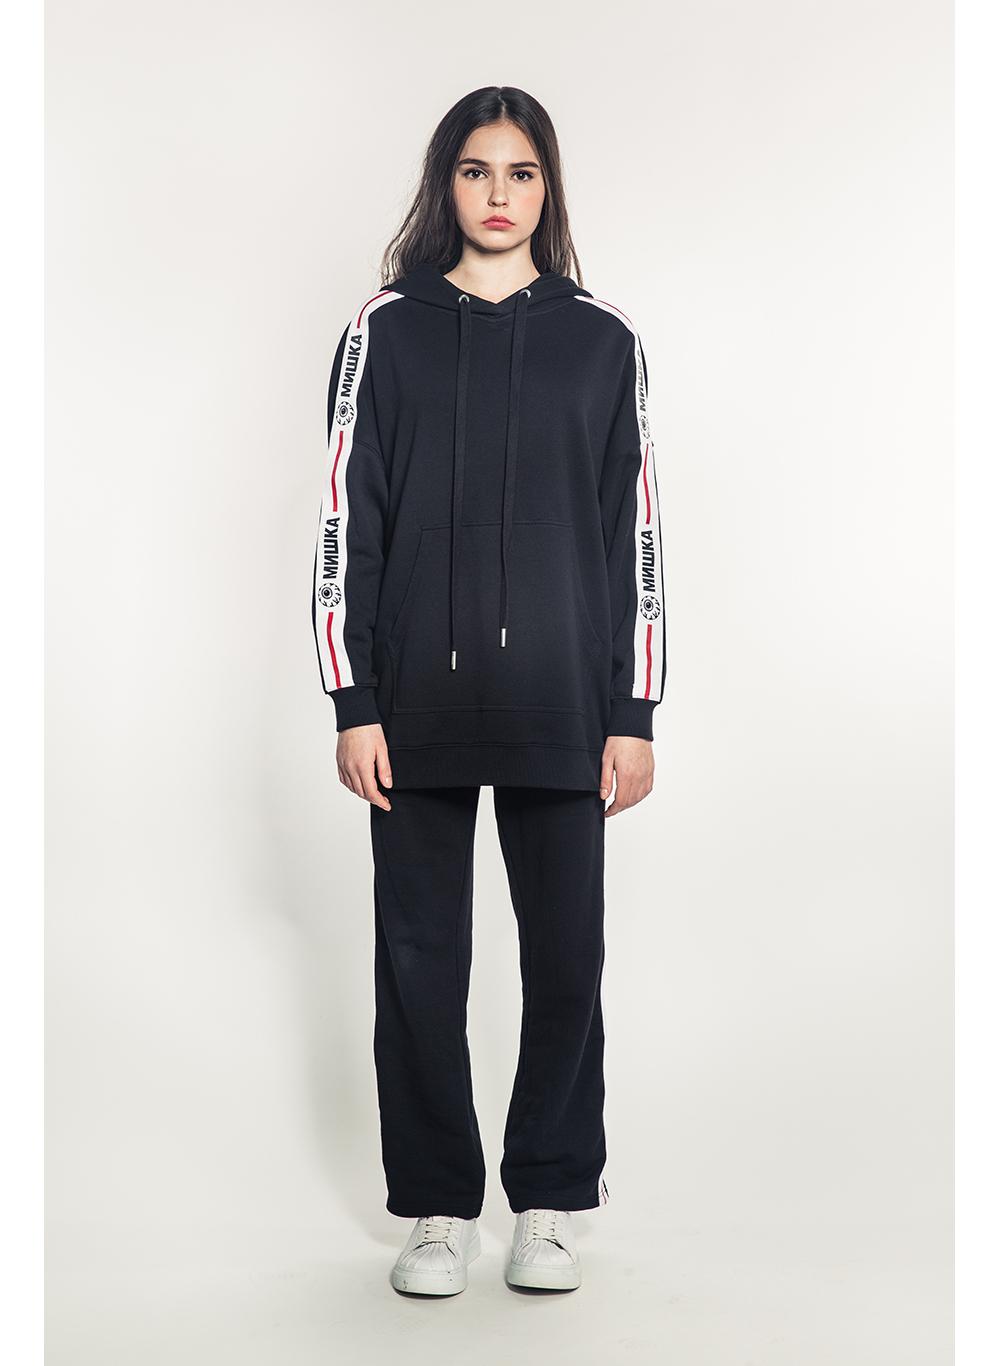 Cyrillic Keep Watch Stripe Women's Pullover Hoodie